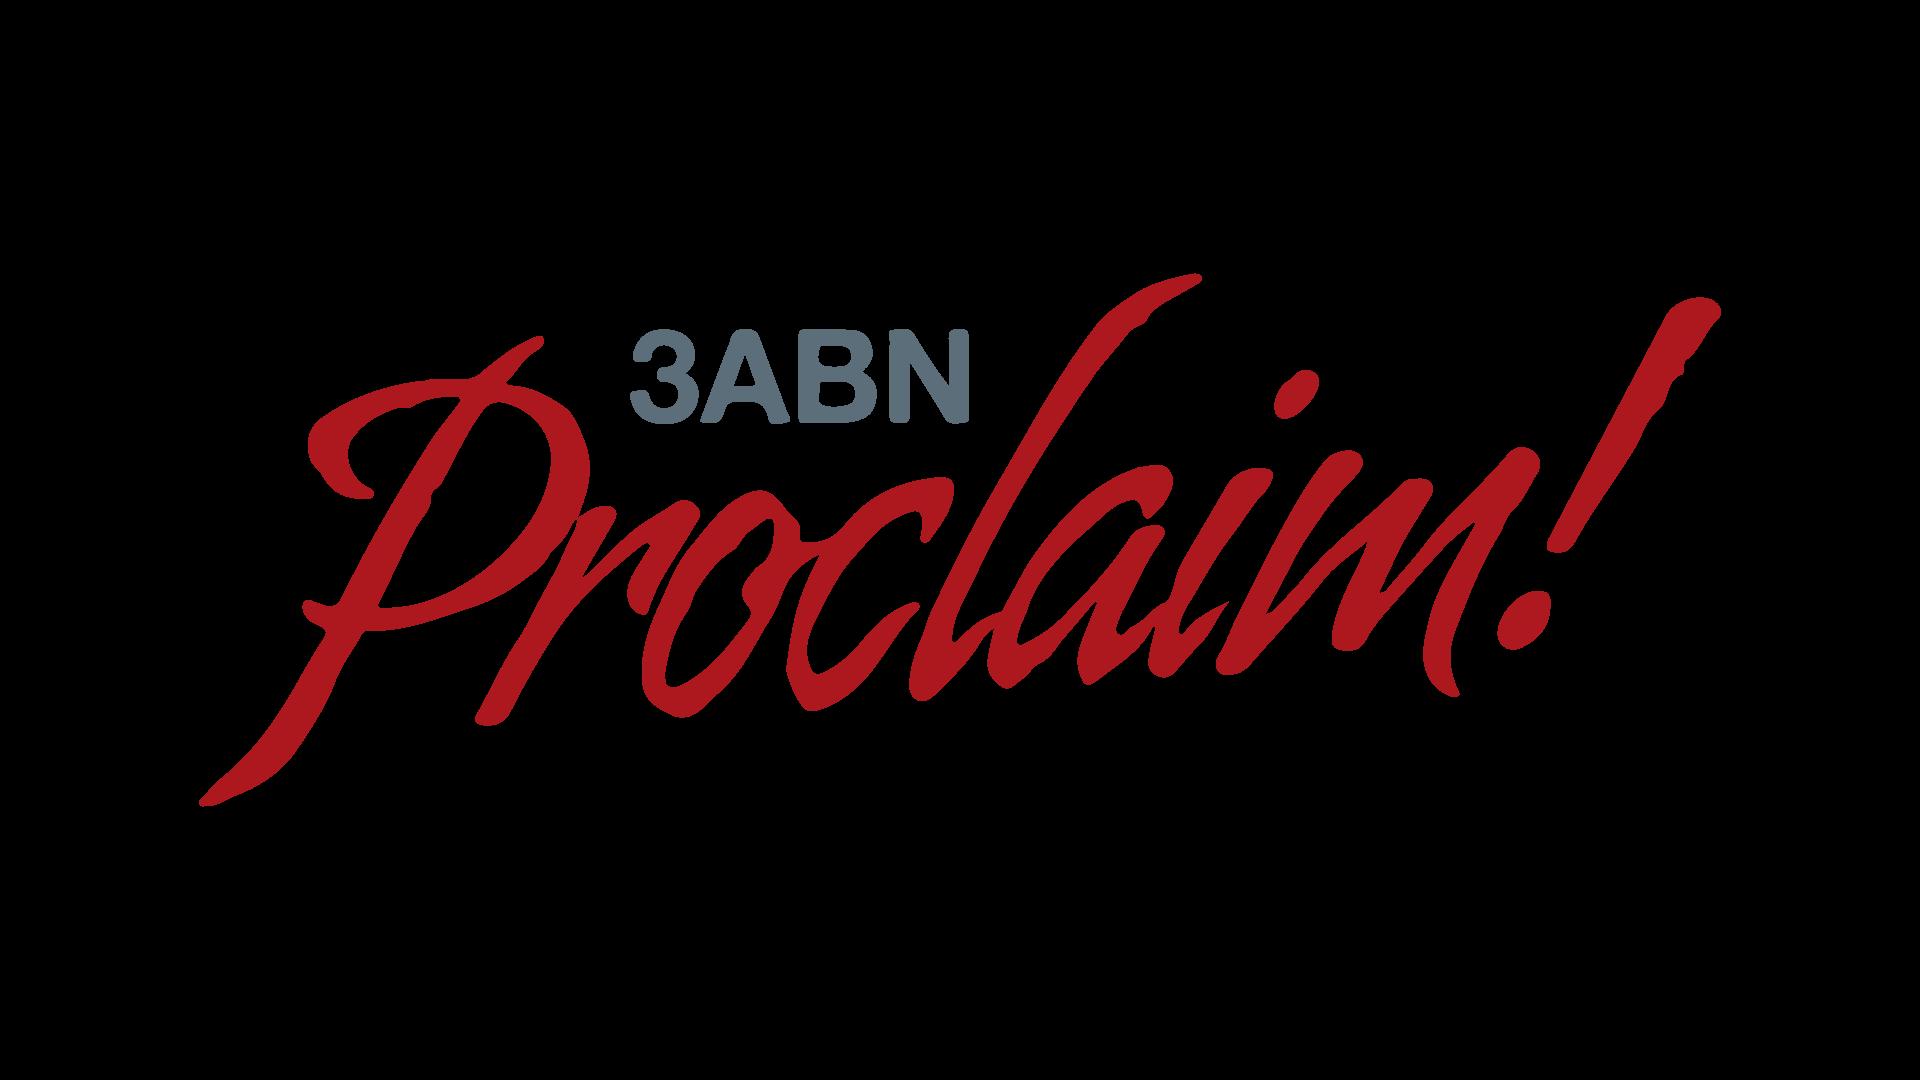 3ABN Proclaim en directo, Online